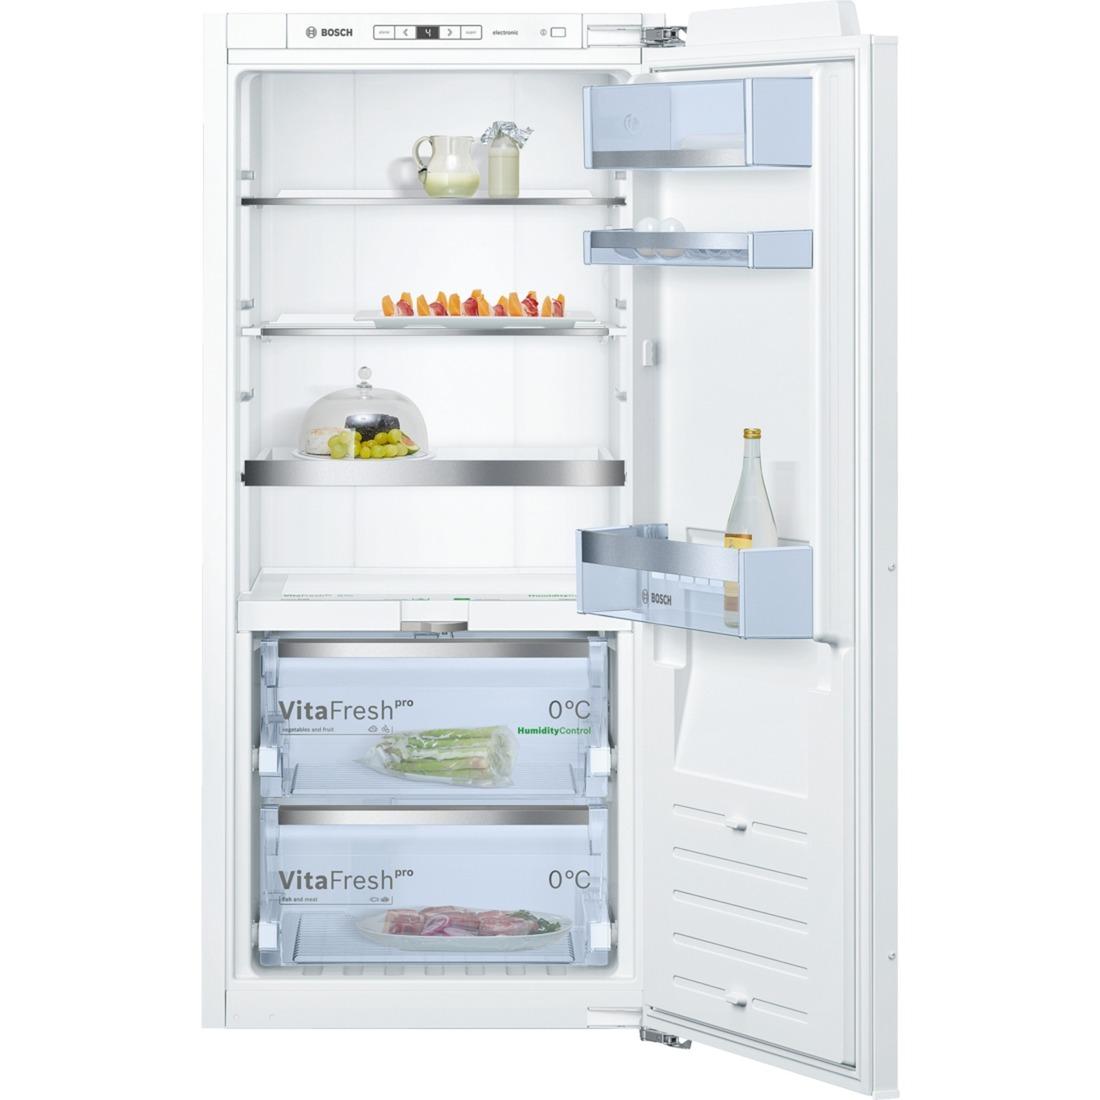 KIF41AD30, Kühlschrank - Preisvergleich